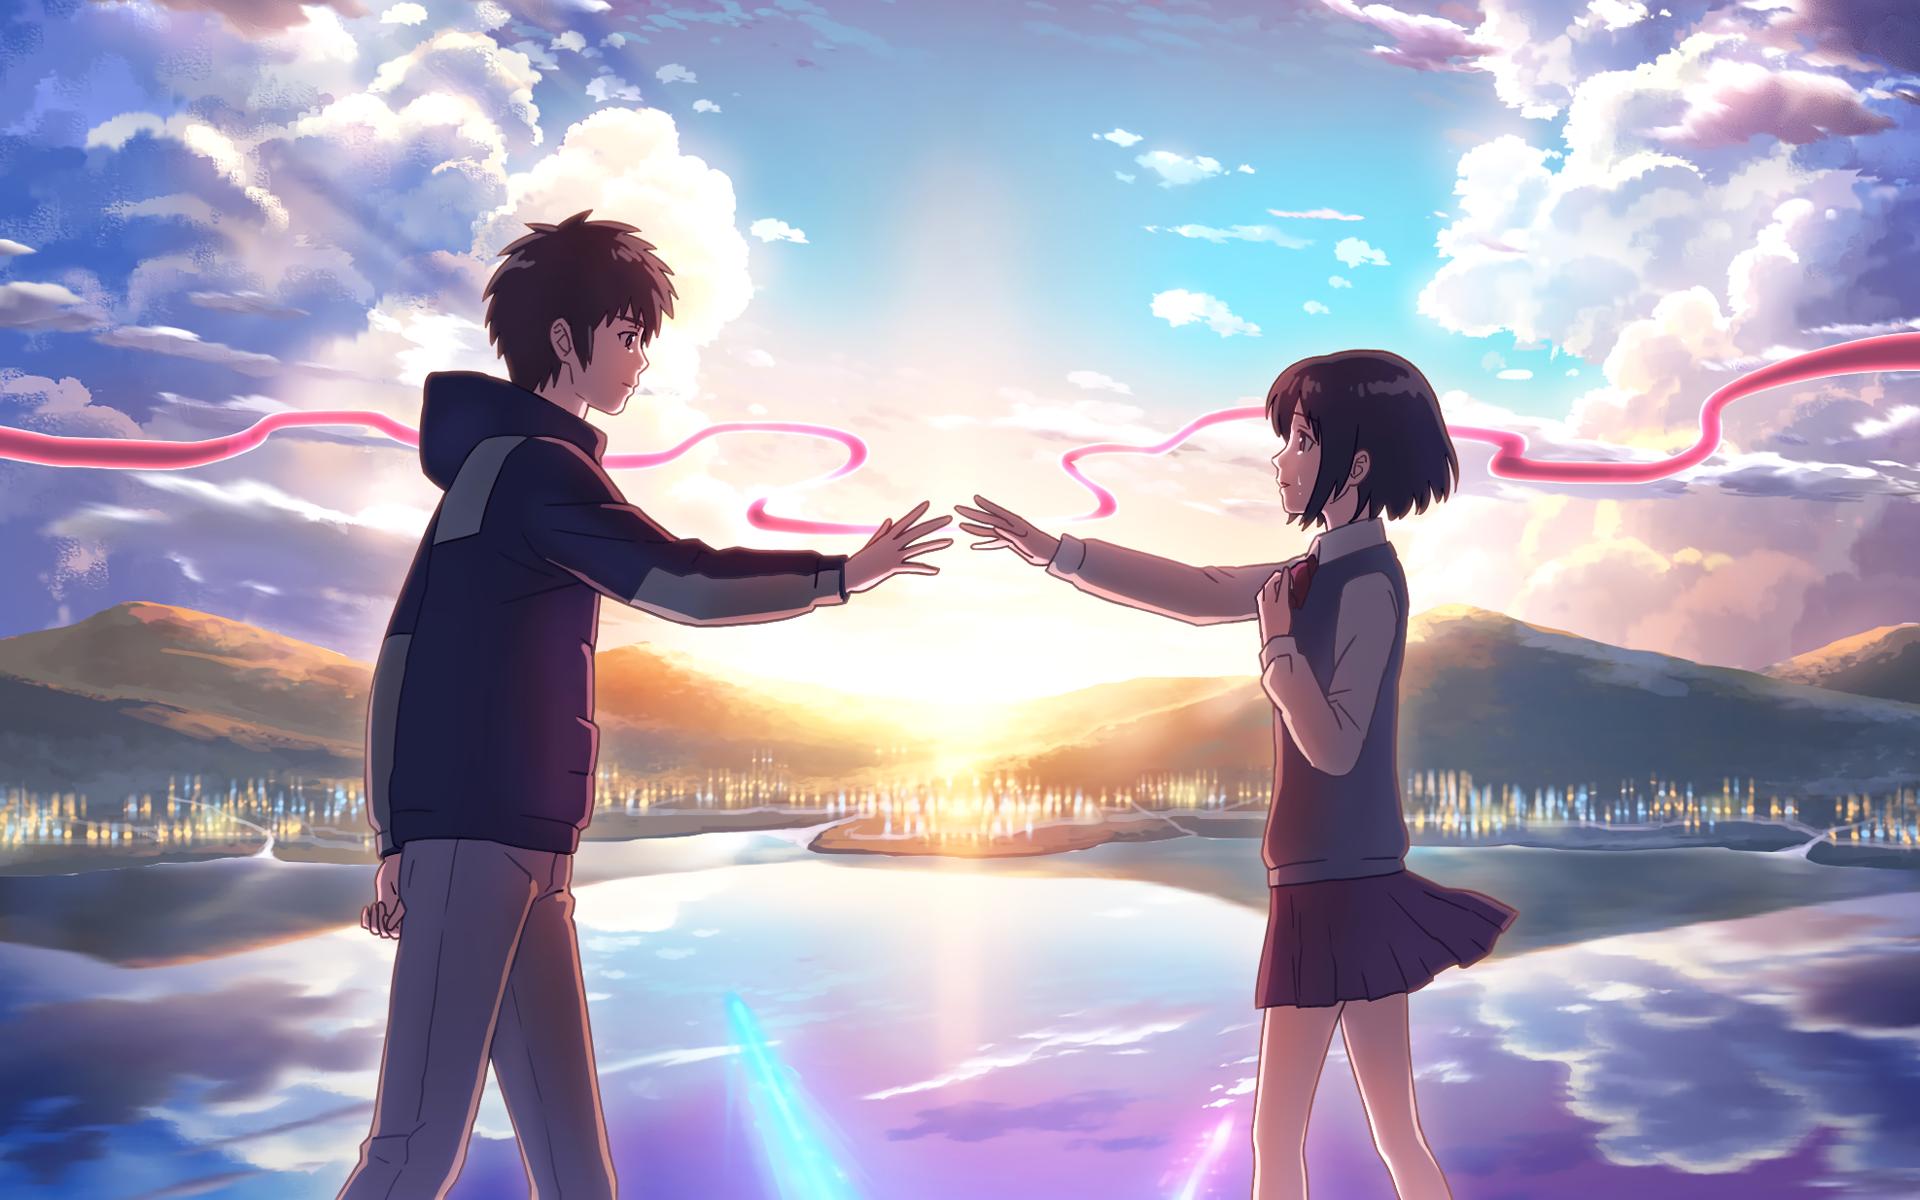 70 Wallpaper Wa Anime Romantis Gratis Terbaik Fondo De Pantalla De Anime Peliculas Anime Romanticas Kimi No Na Wa